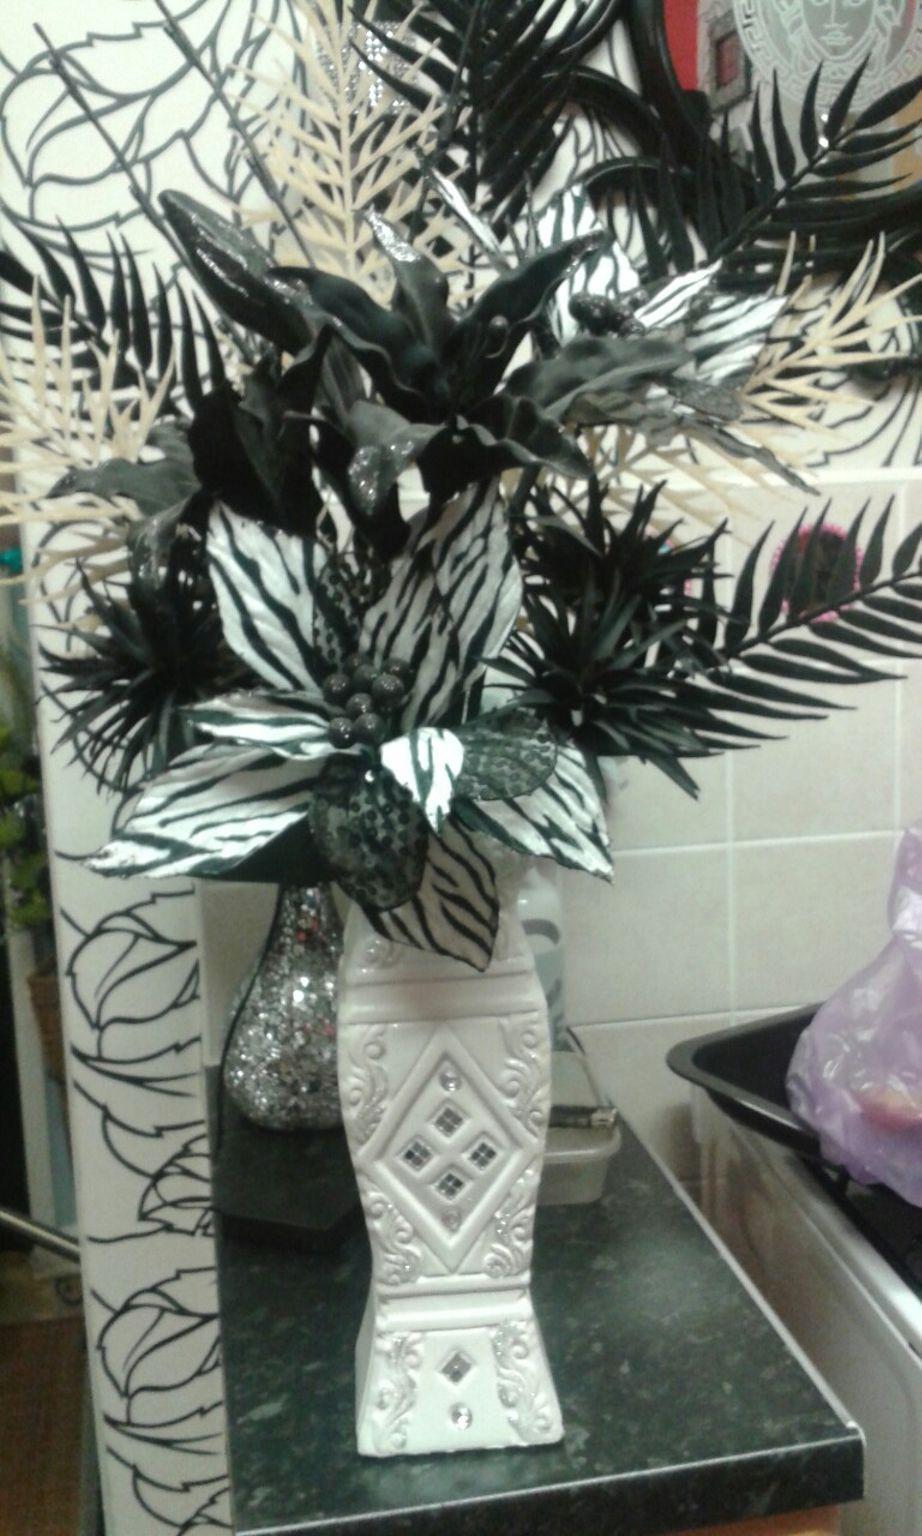 24 Lovely Match Pewter Vase 2021 free download match pewter vase of https en shpock com i wsp8sebccdzdaok1 2018 04 04t001557 with regard to flowers in vase with lights 615de0a8